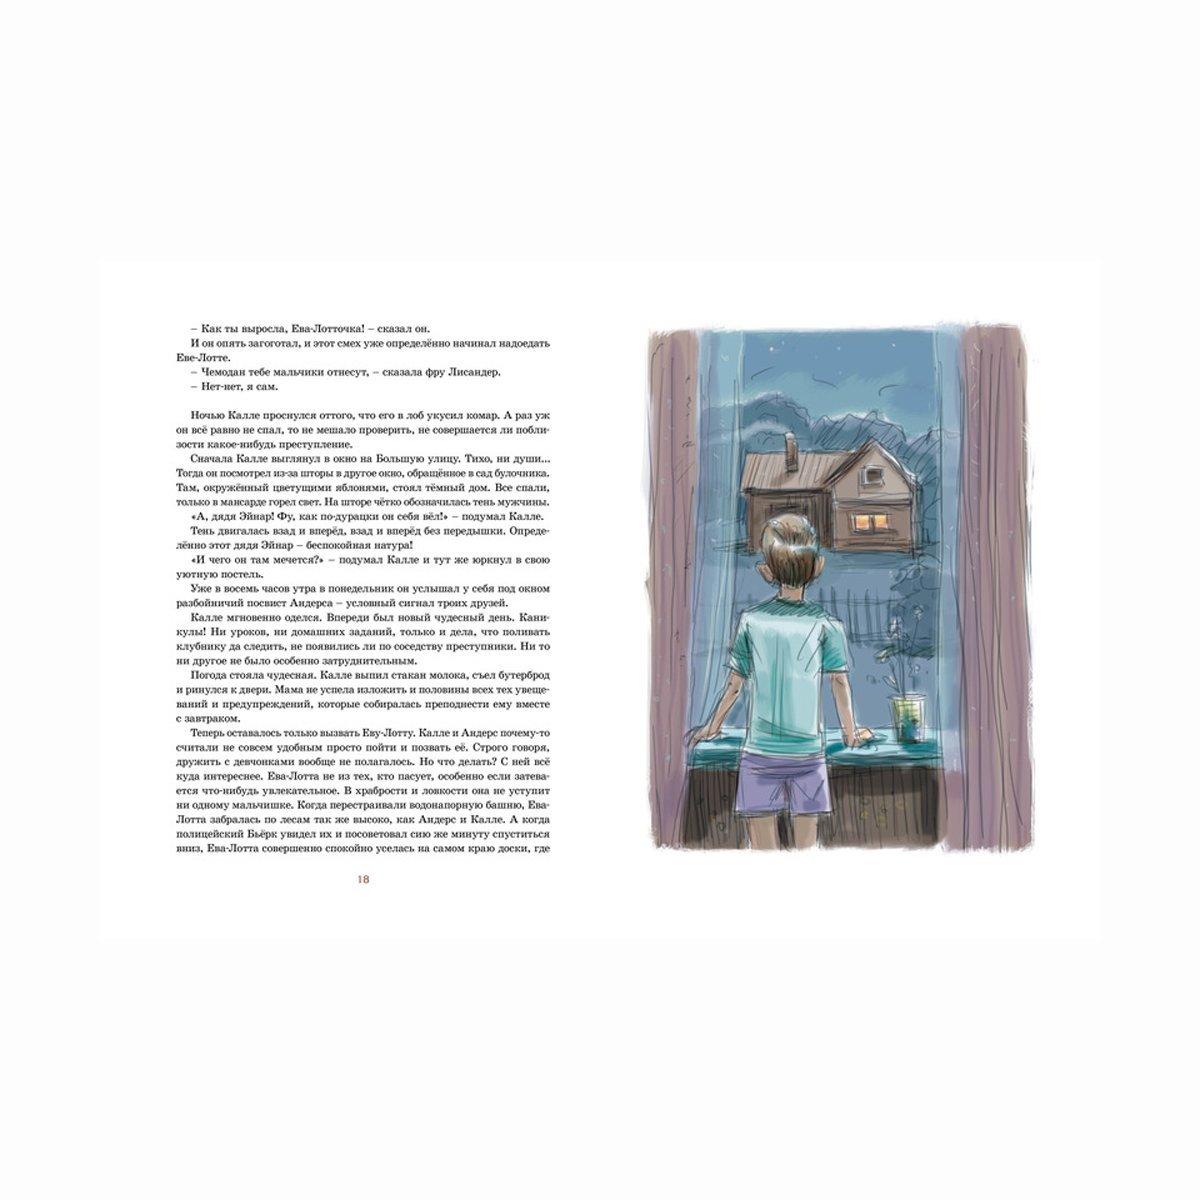 Купить Художественная литература, Линдгрен А., Приключения Калле Блюмквиста, Machaon, 56с. 978-5-389-11162-2 ТМ: Machaon